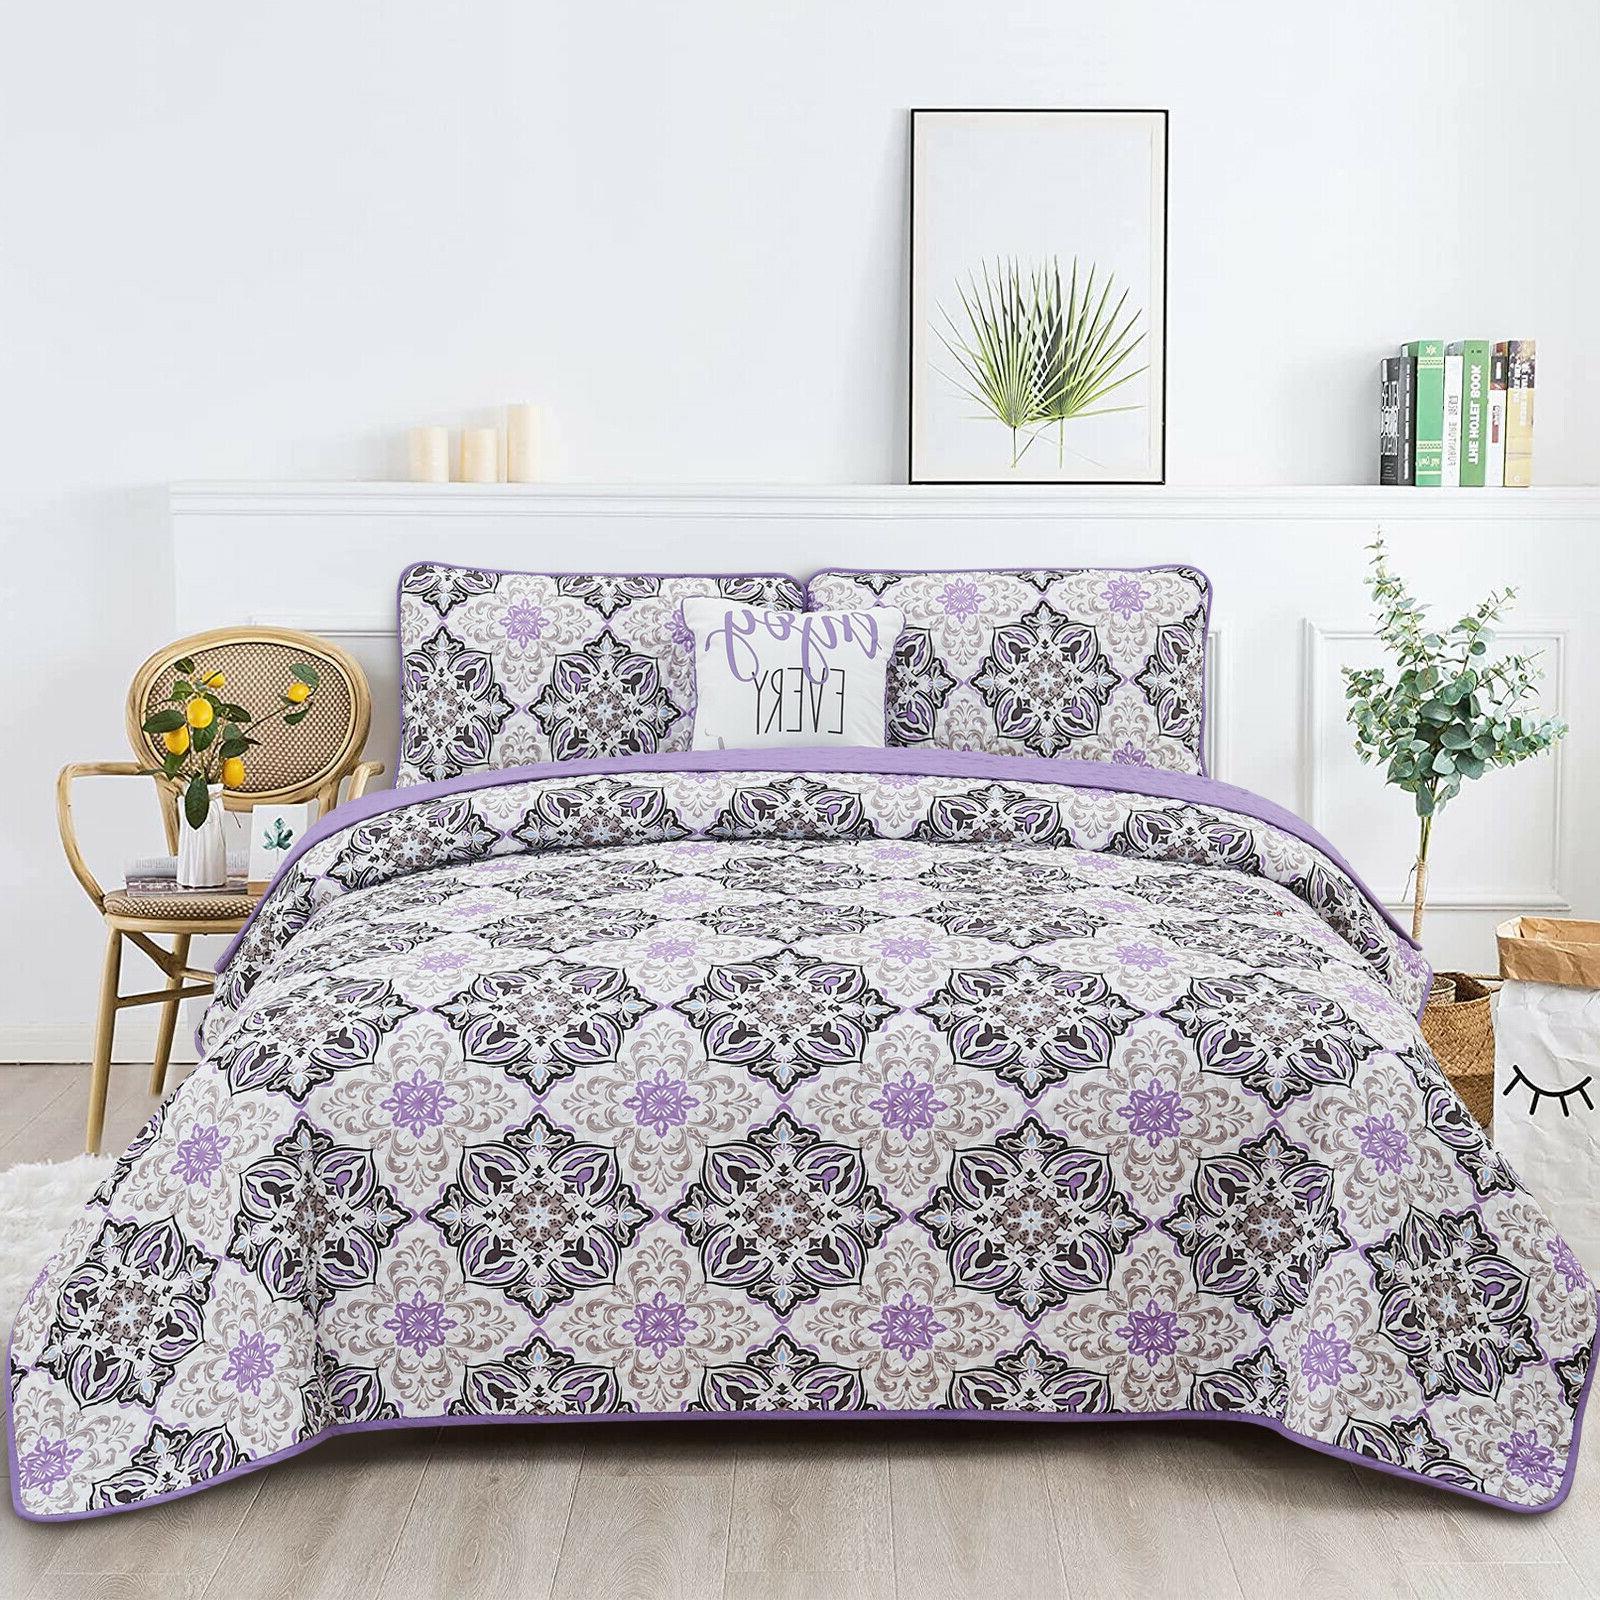 Quilt 4 Piece Bedspread Queen King Size Down Alternative Cov